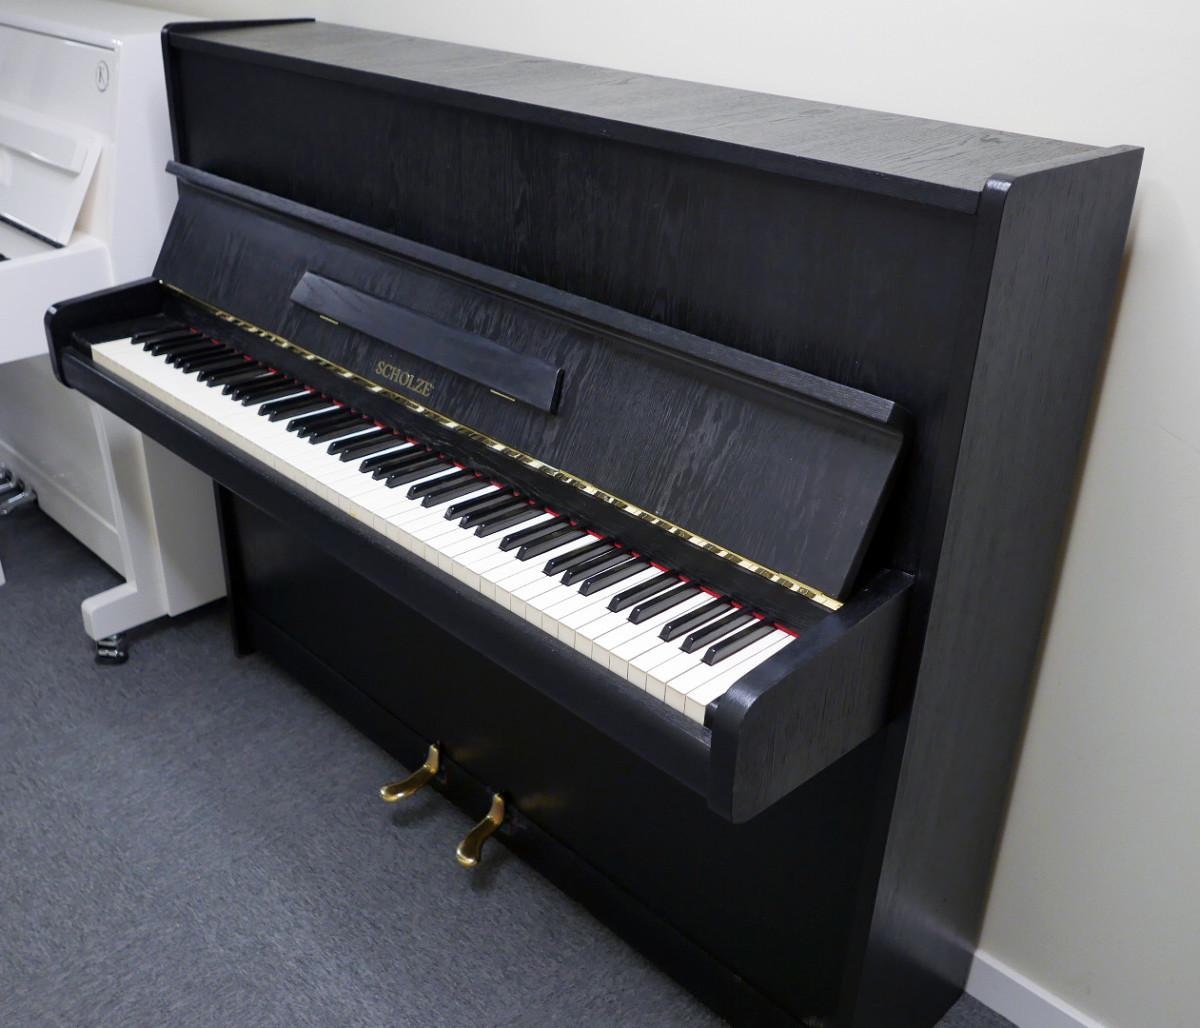 piano vertical scholze115 #54916 vista general tapa abierta